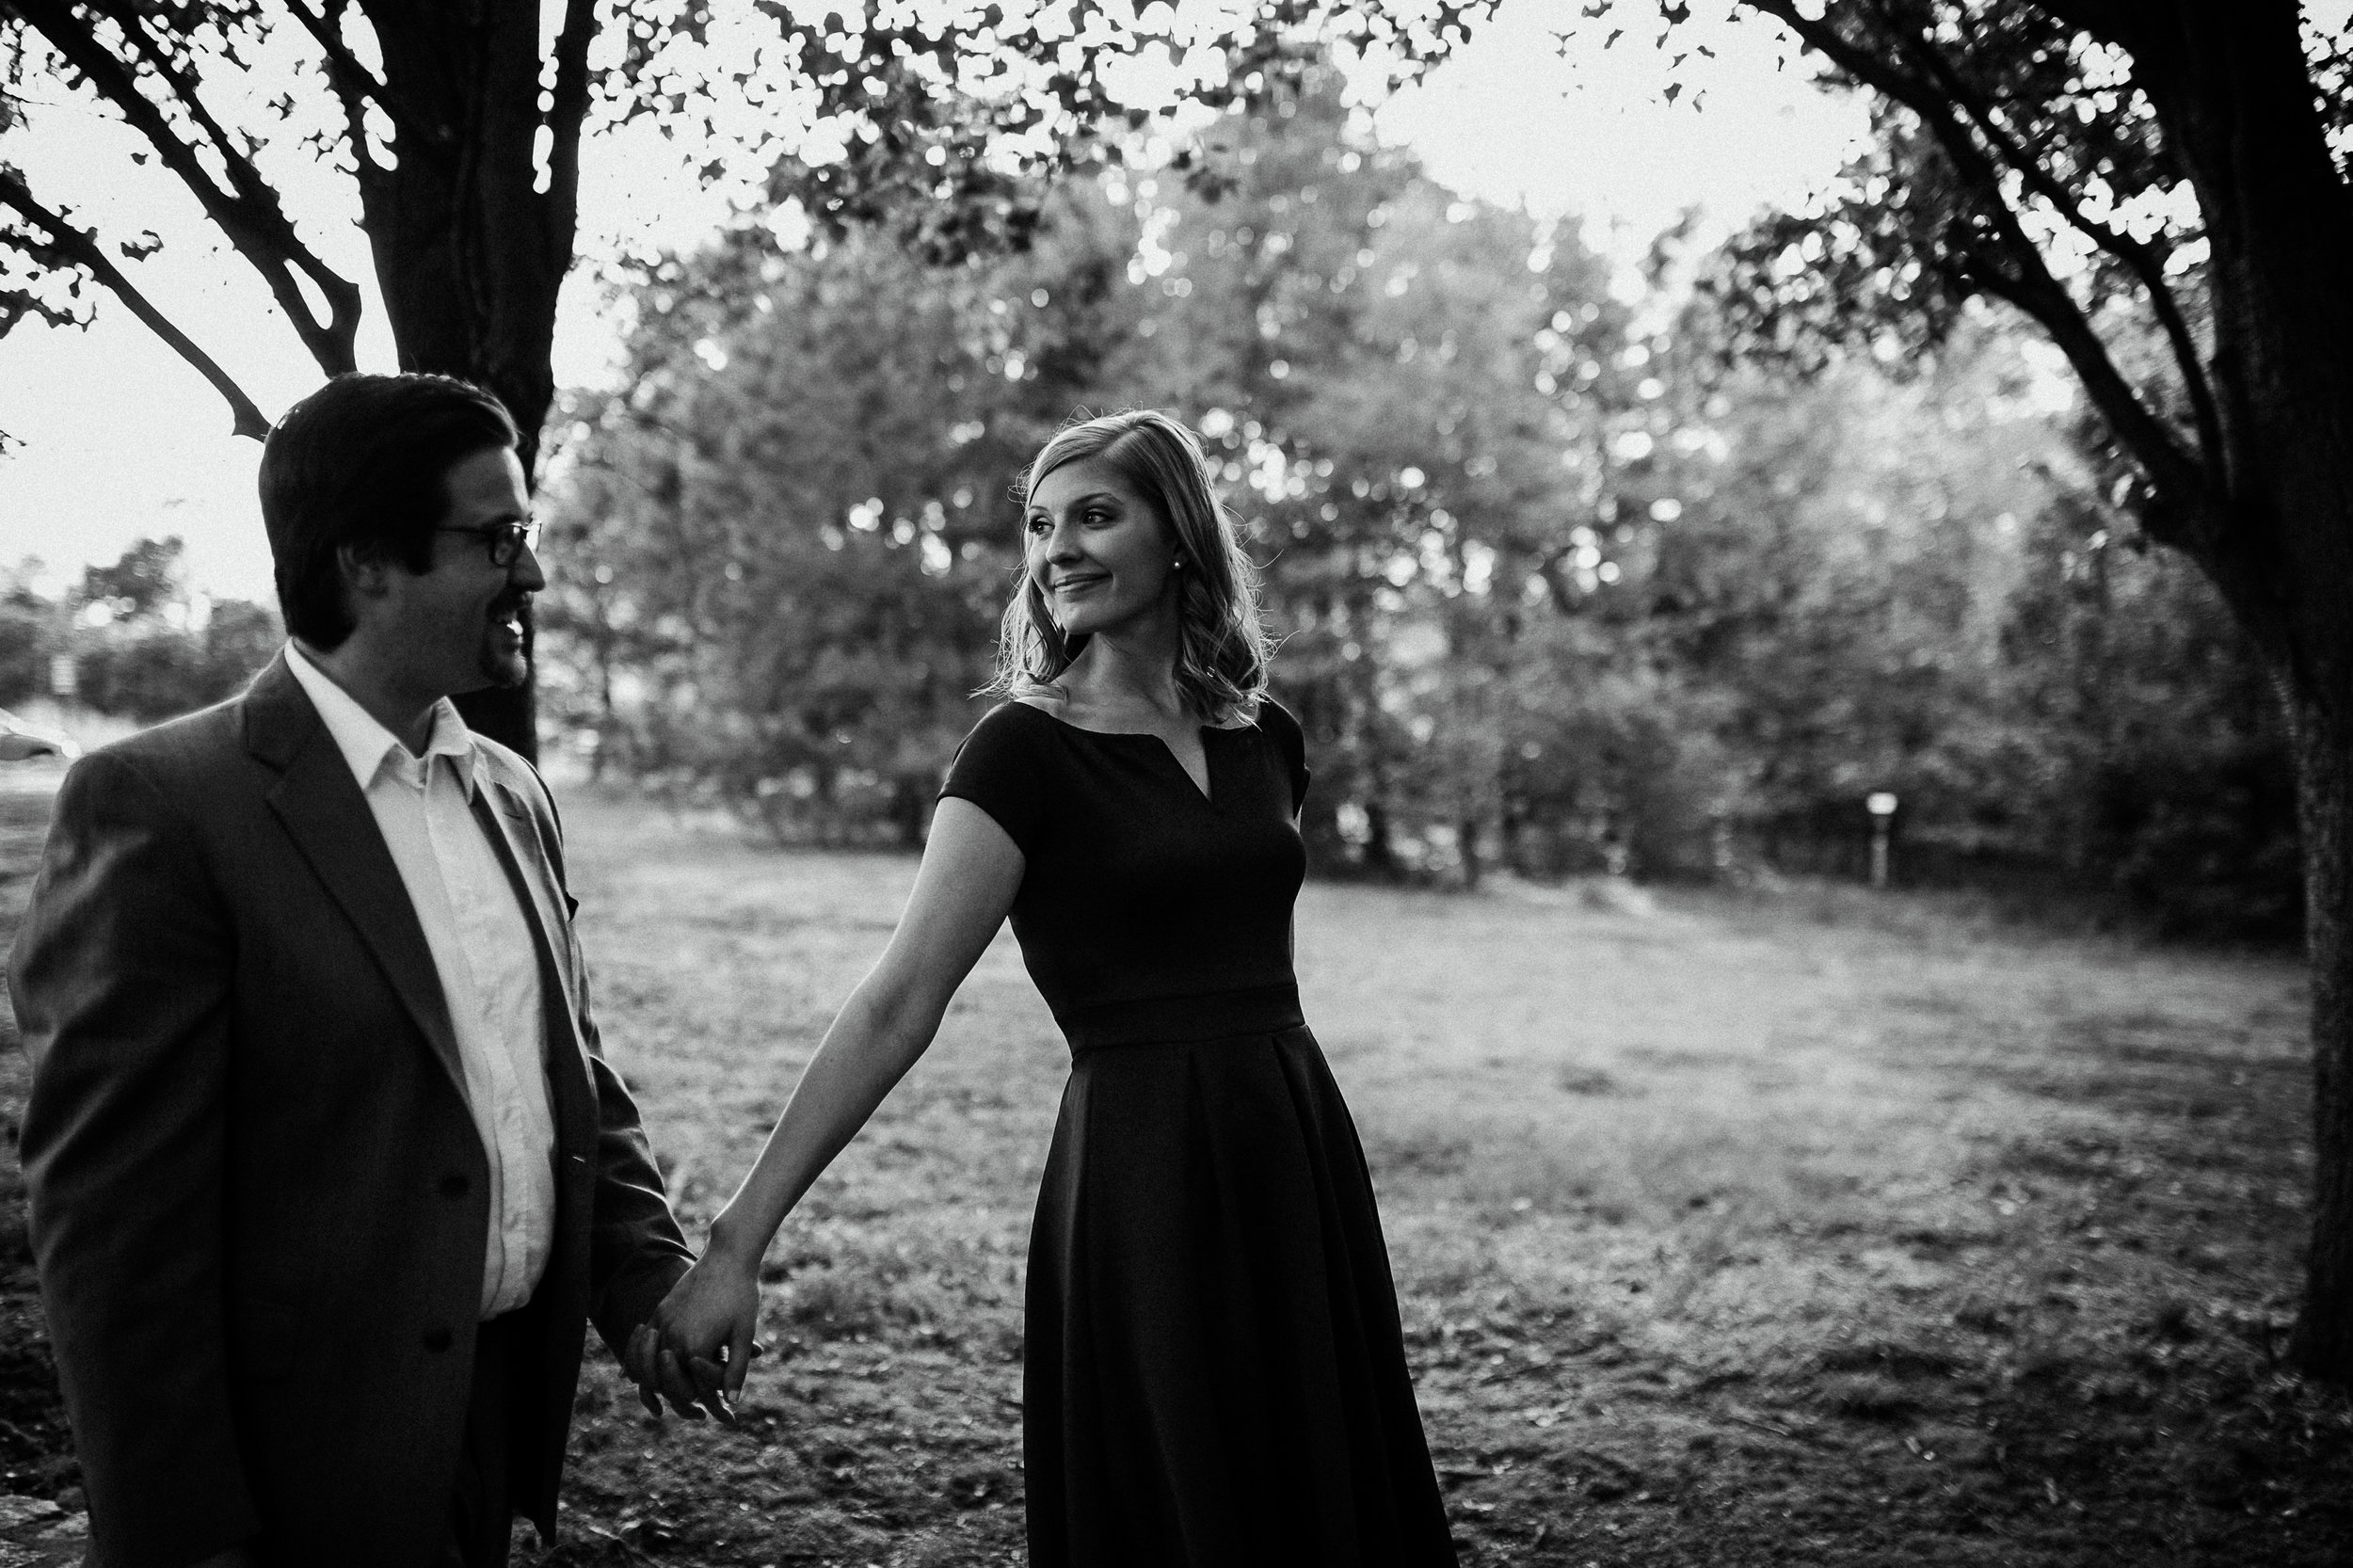 Stephanieandtommyjoe.richmondvirginia.foresthillpark.engagementsession.rebeccaburtphotography-11.jpg